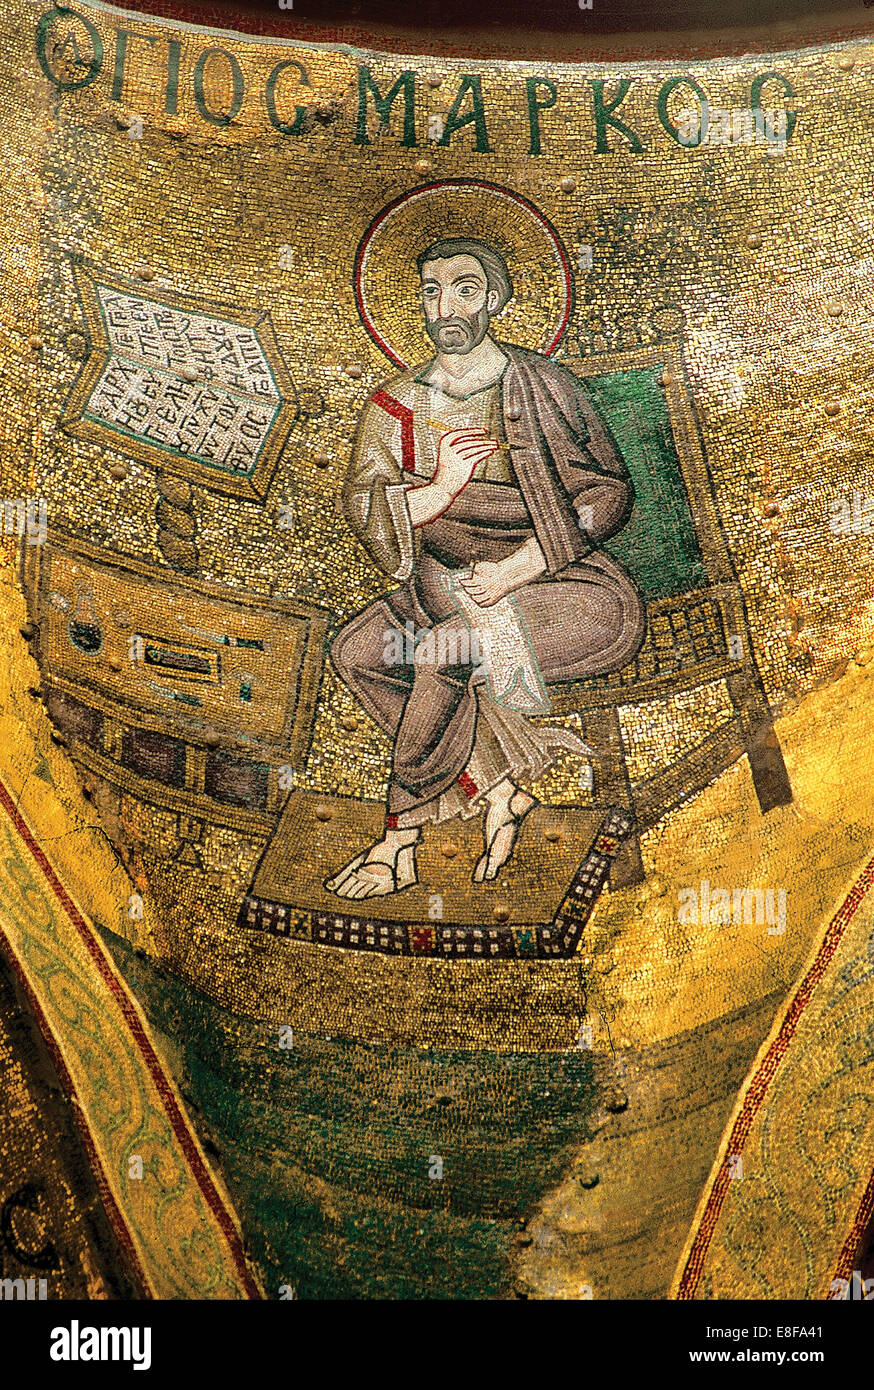 Saint Mark the Evangelist. Artist: Byzantine Master - Stock Image